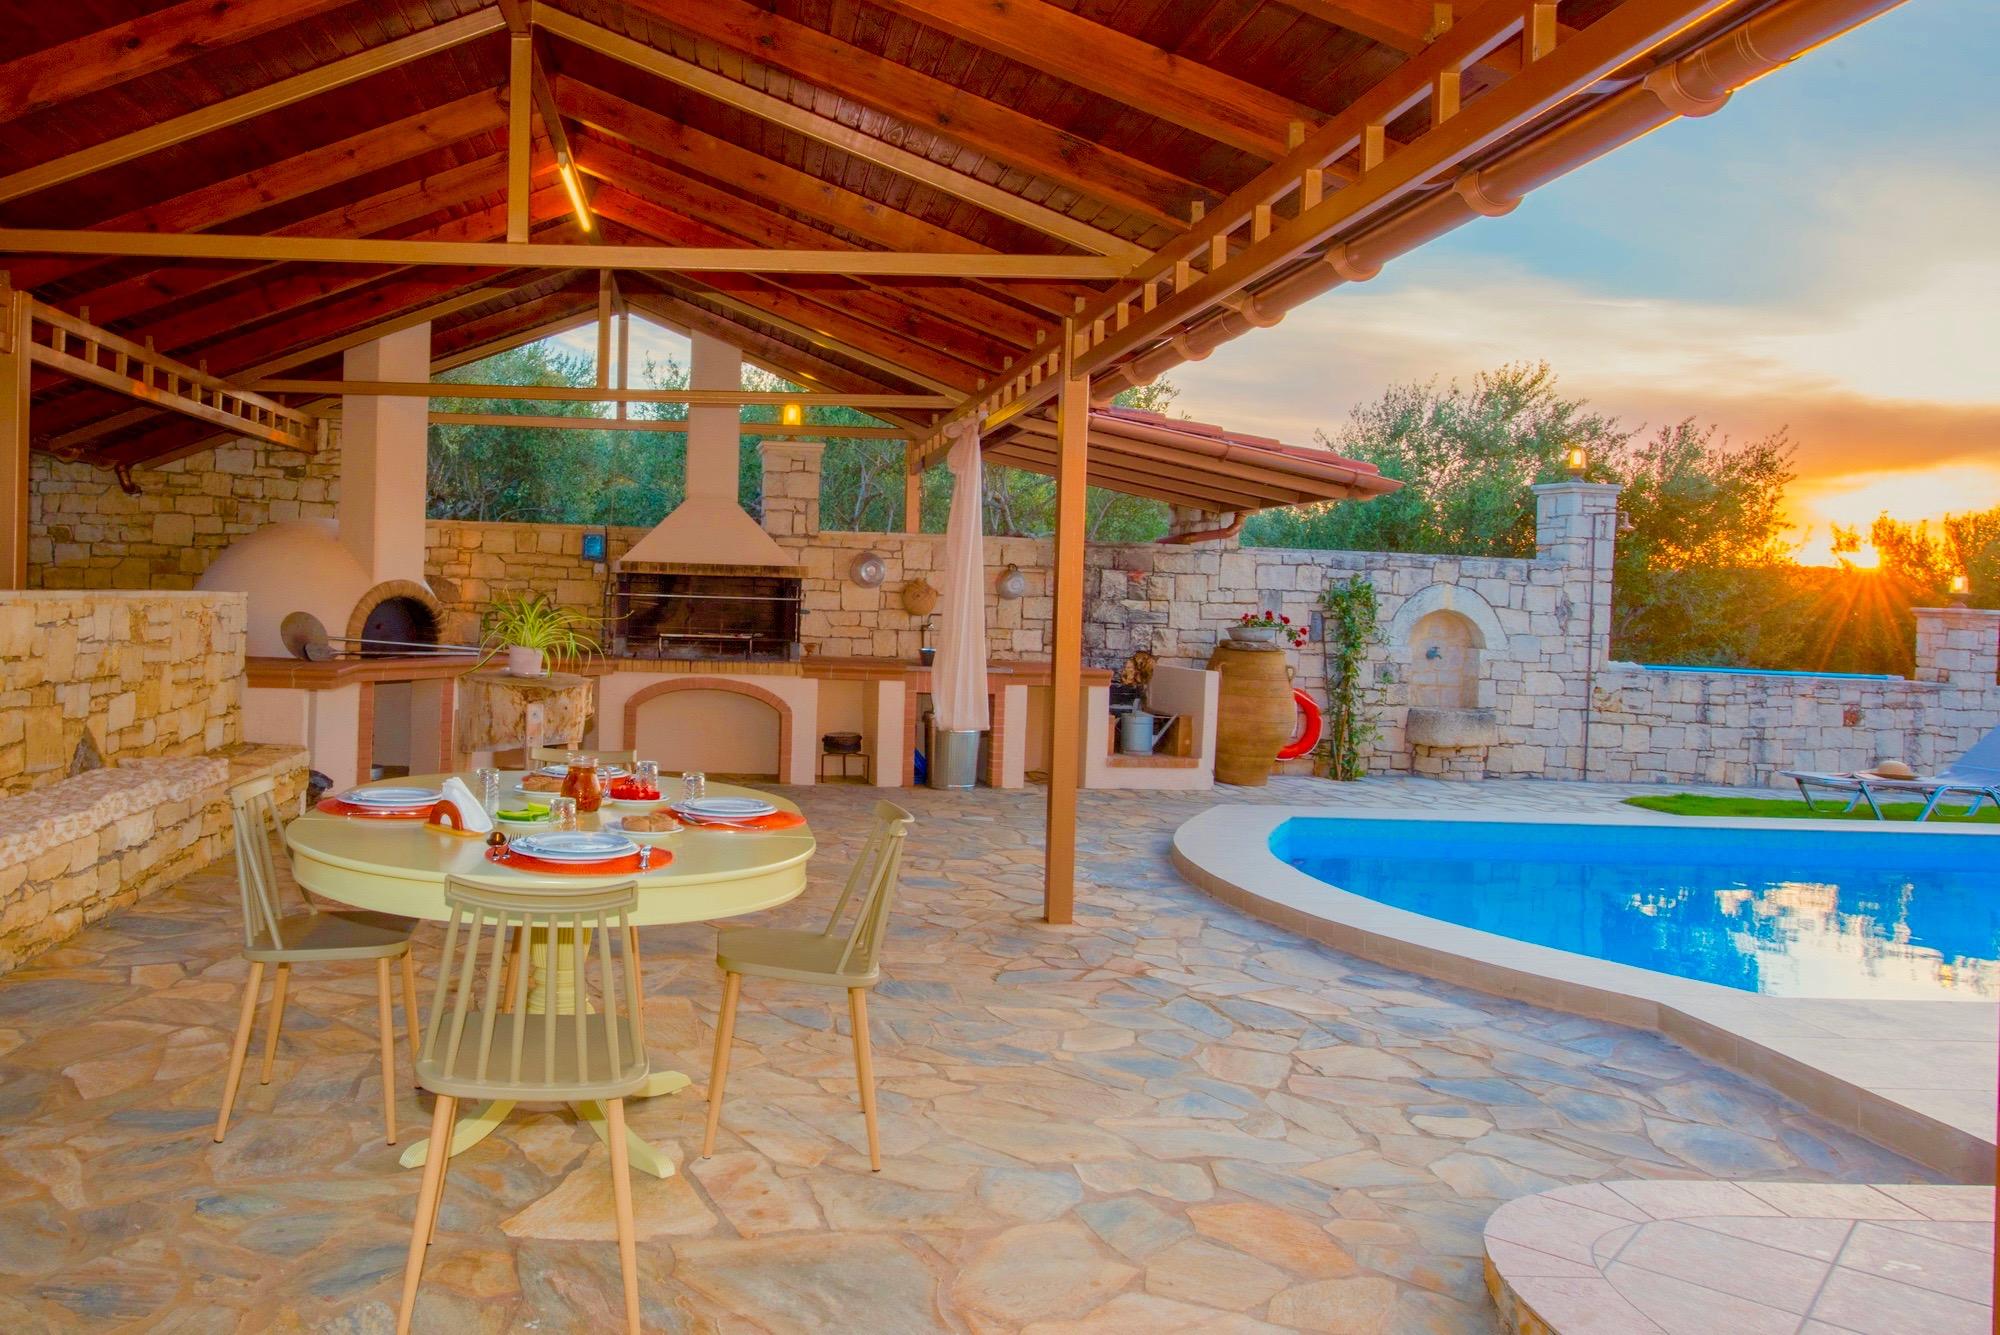 Ferienhaus Luxury Villa Korini with private swimming pool (2470495), Roumeli, Kreta Nordküste, Kreta, Griechenland, Bild 31